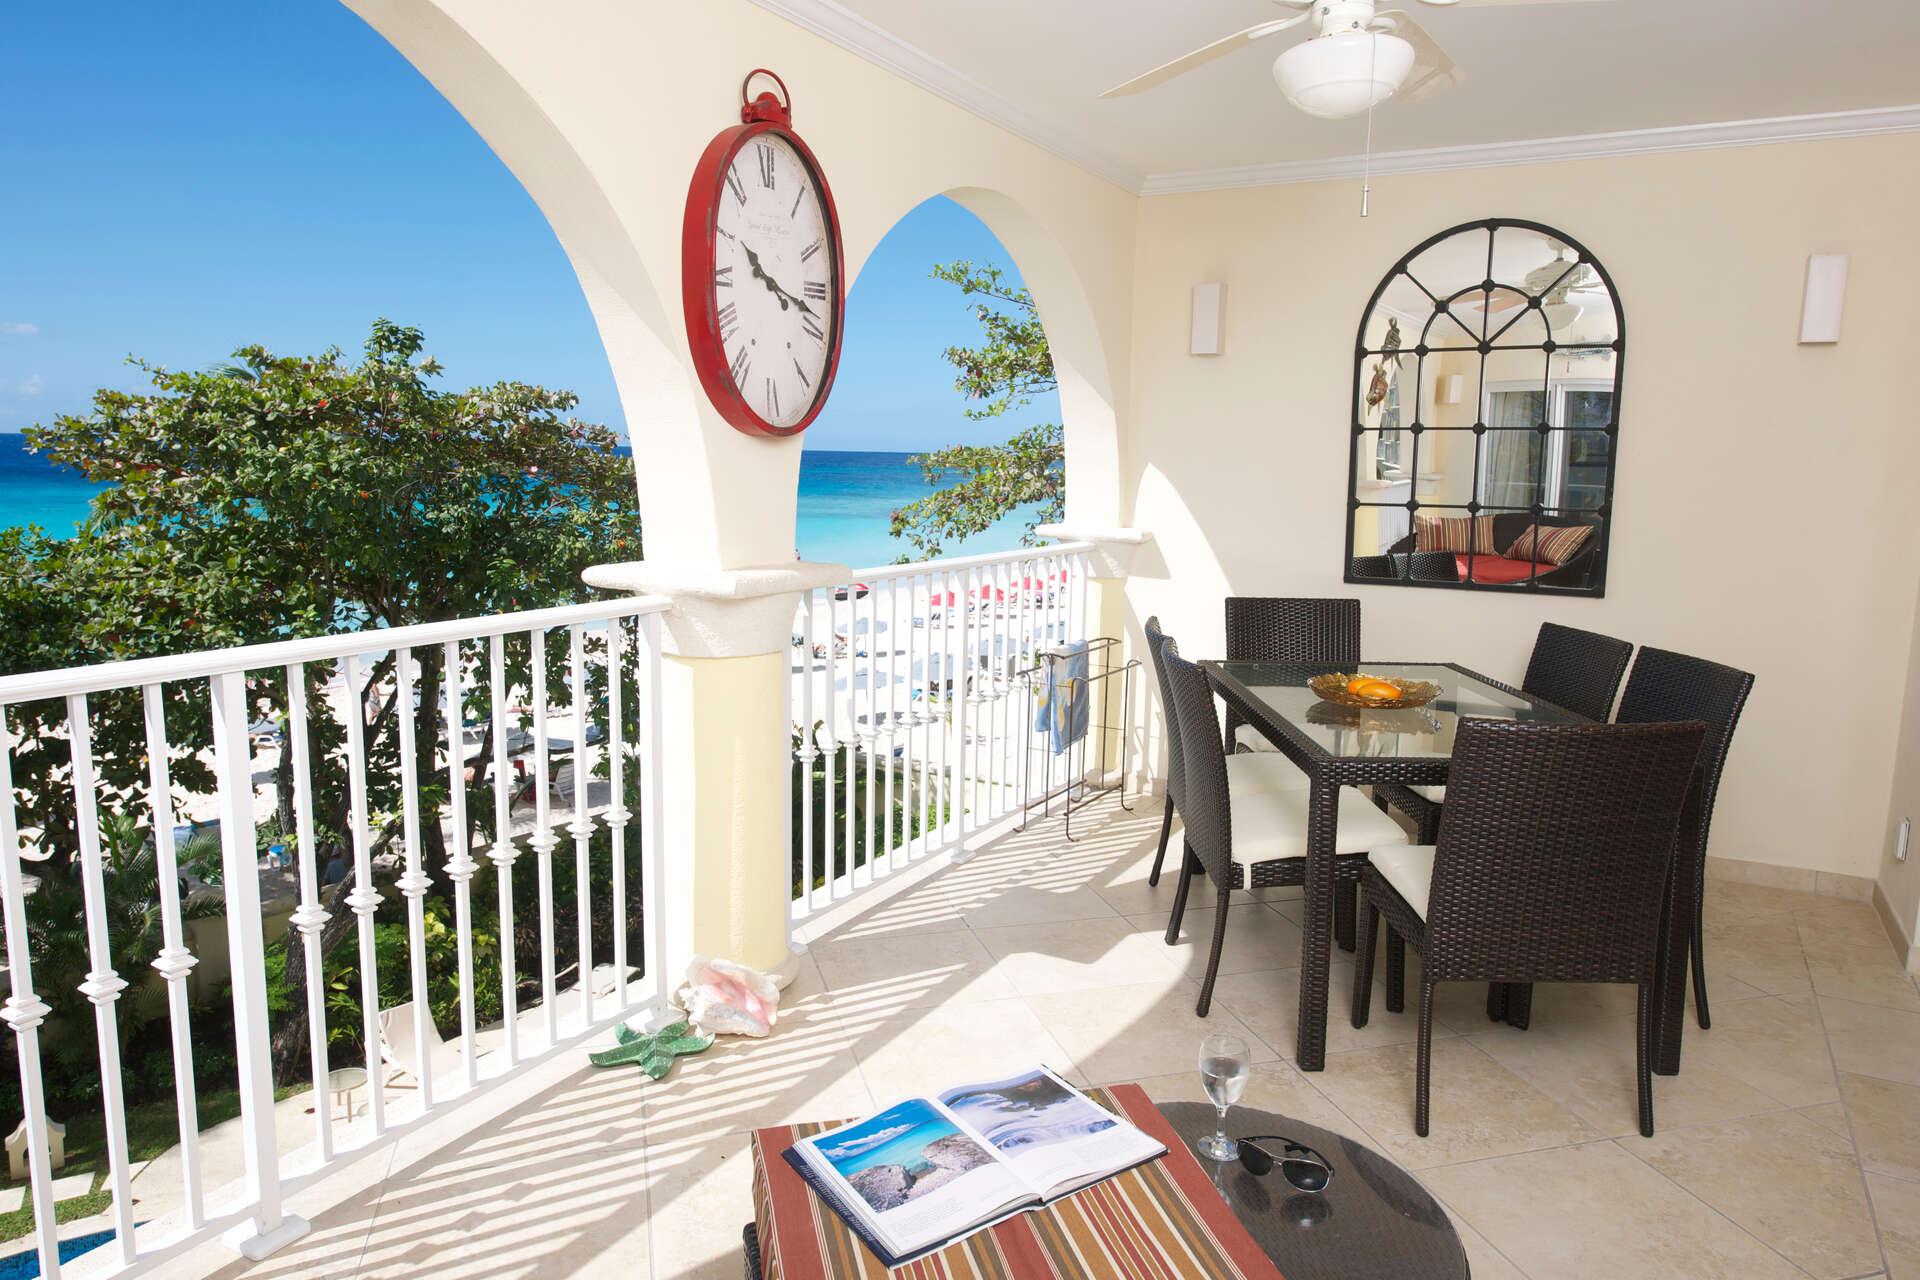 Luxury villa rentals caribbean - Barbados - Christ church - Oistins  - Sapphire Beach 203 - Image 1/14